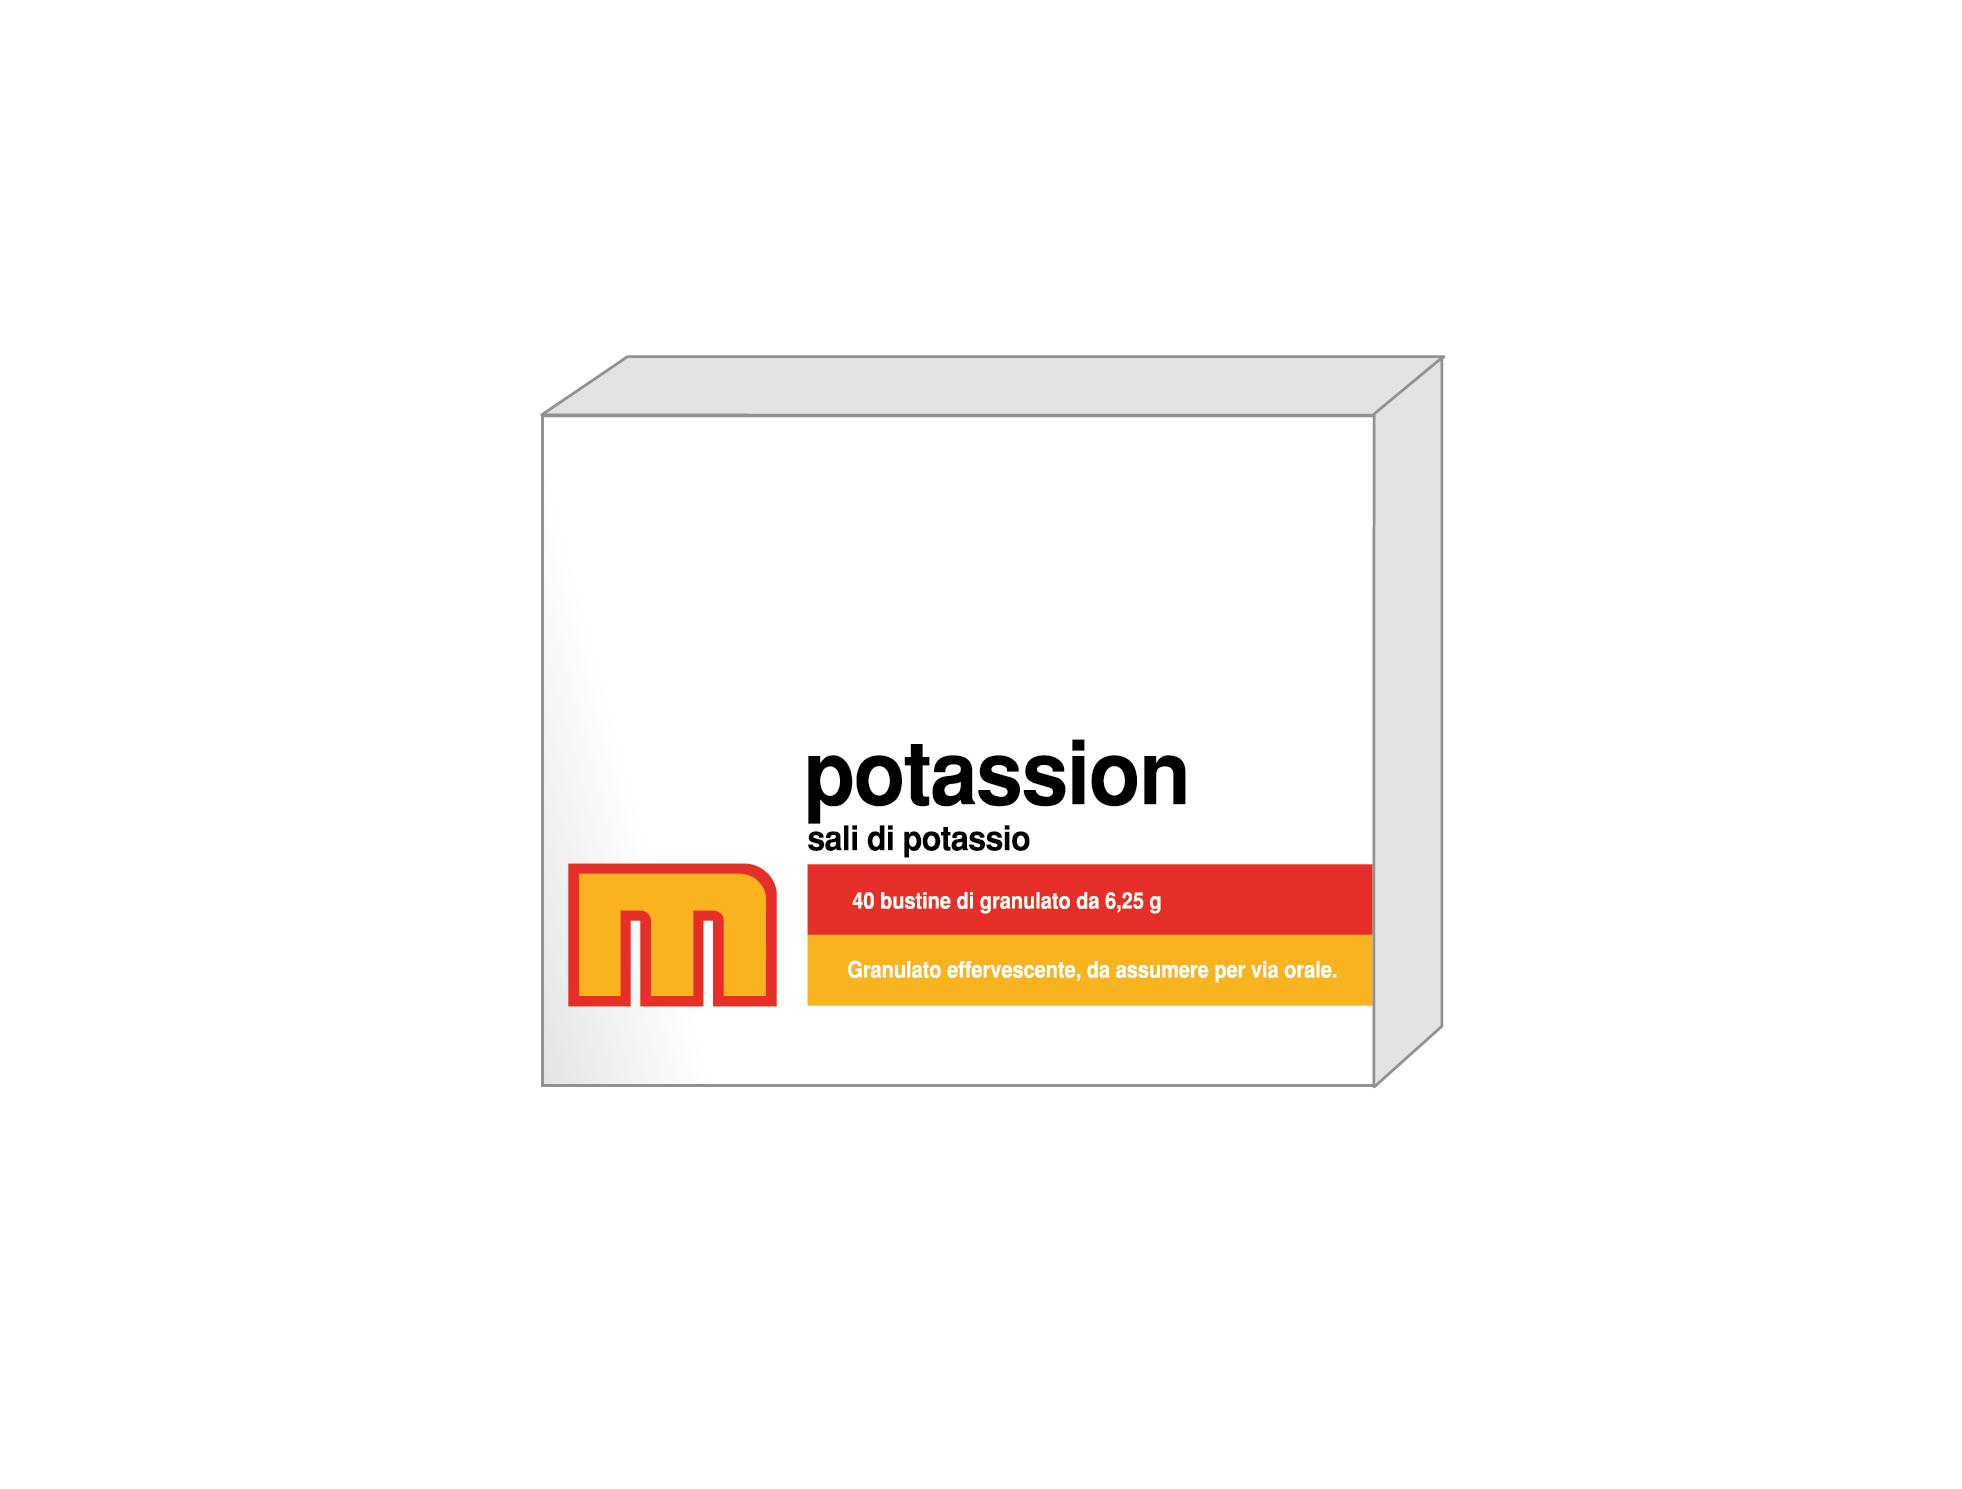 POTASSION*GRAT EFF 40BUST - Farmastop